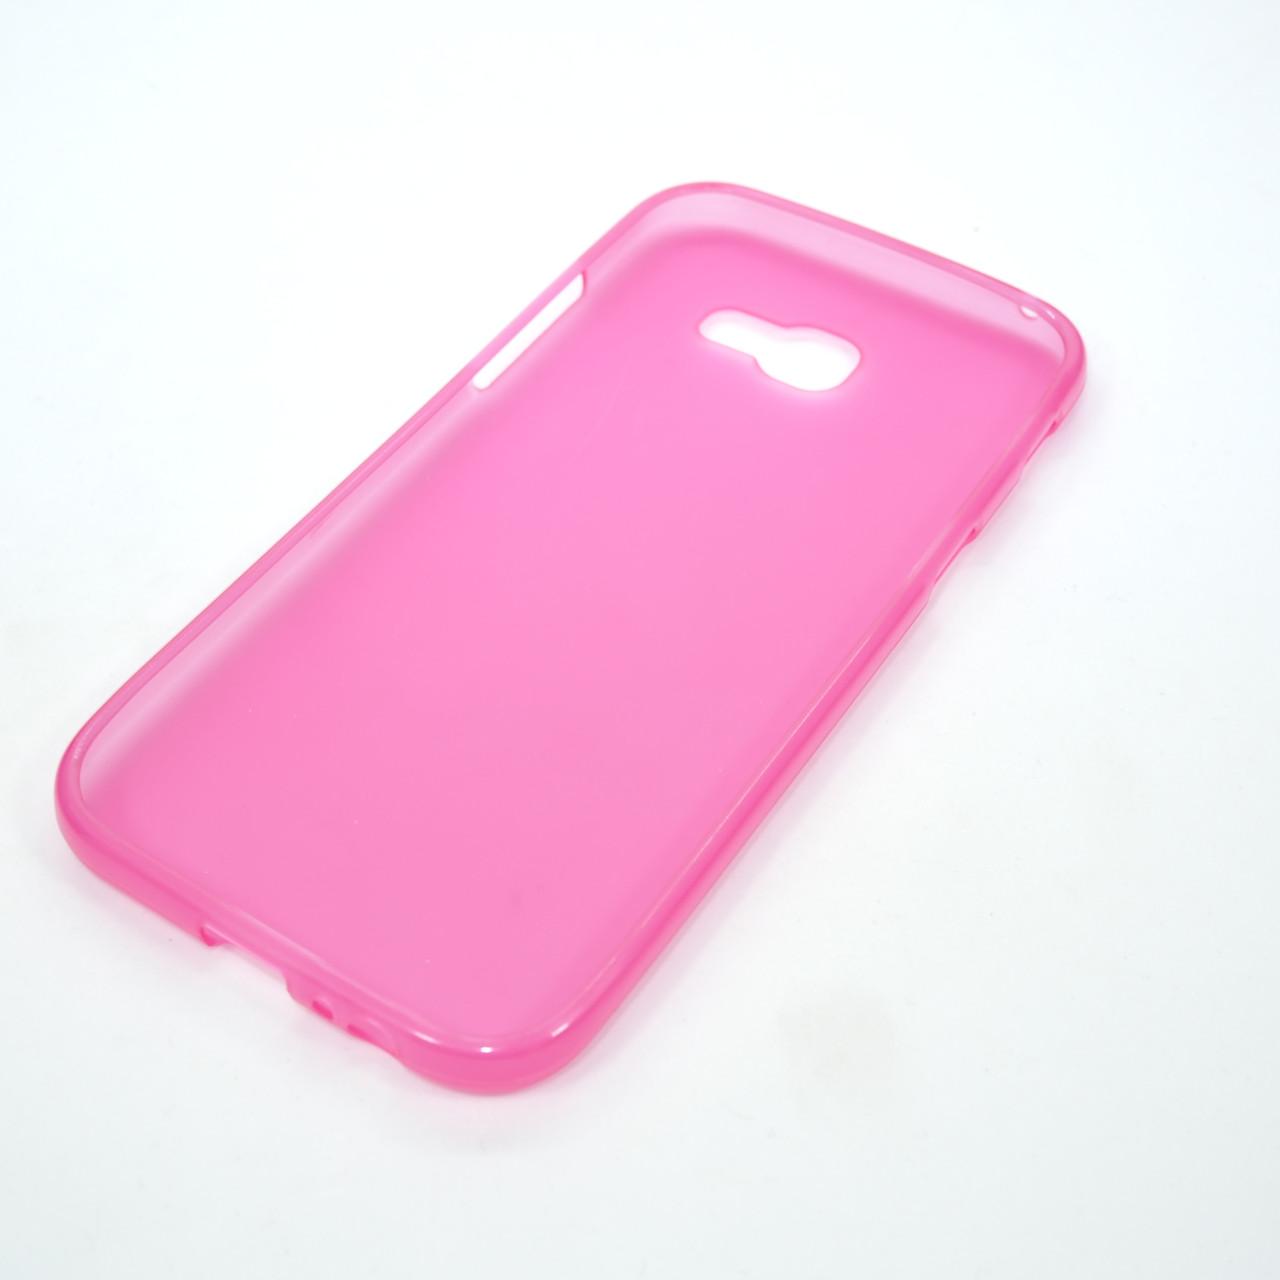 TPU Samsung A520 pink Galaxy A5 (A520) 2017 Для телефона